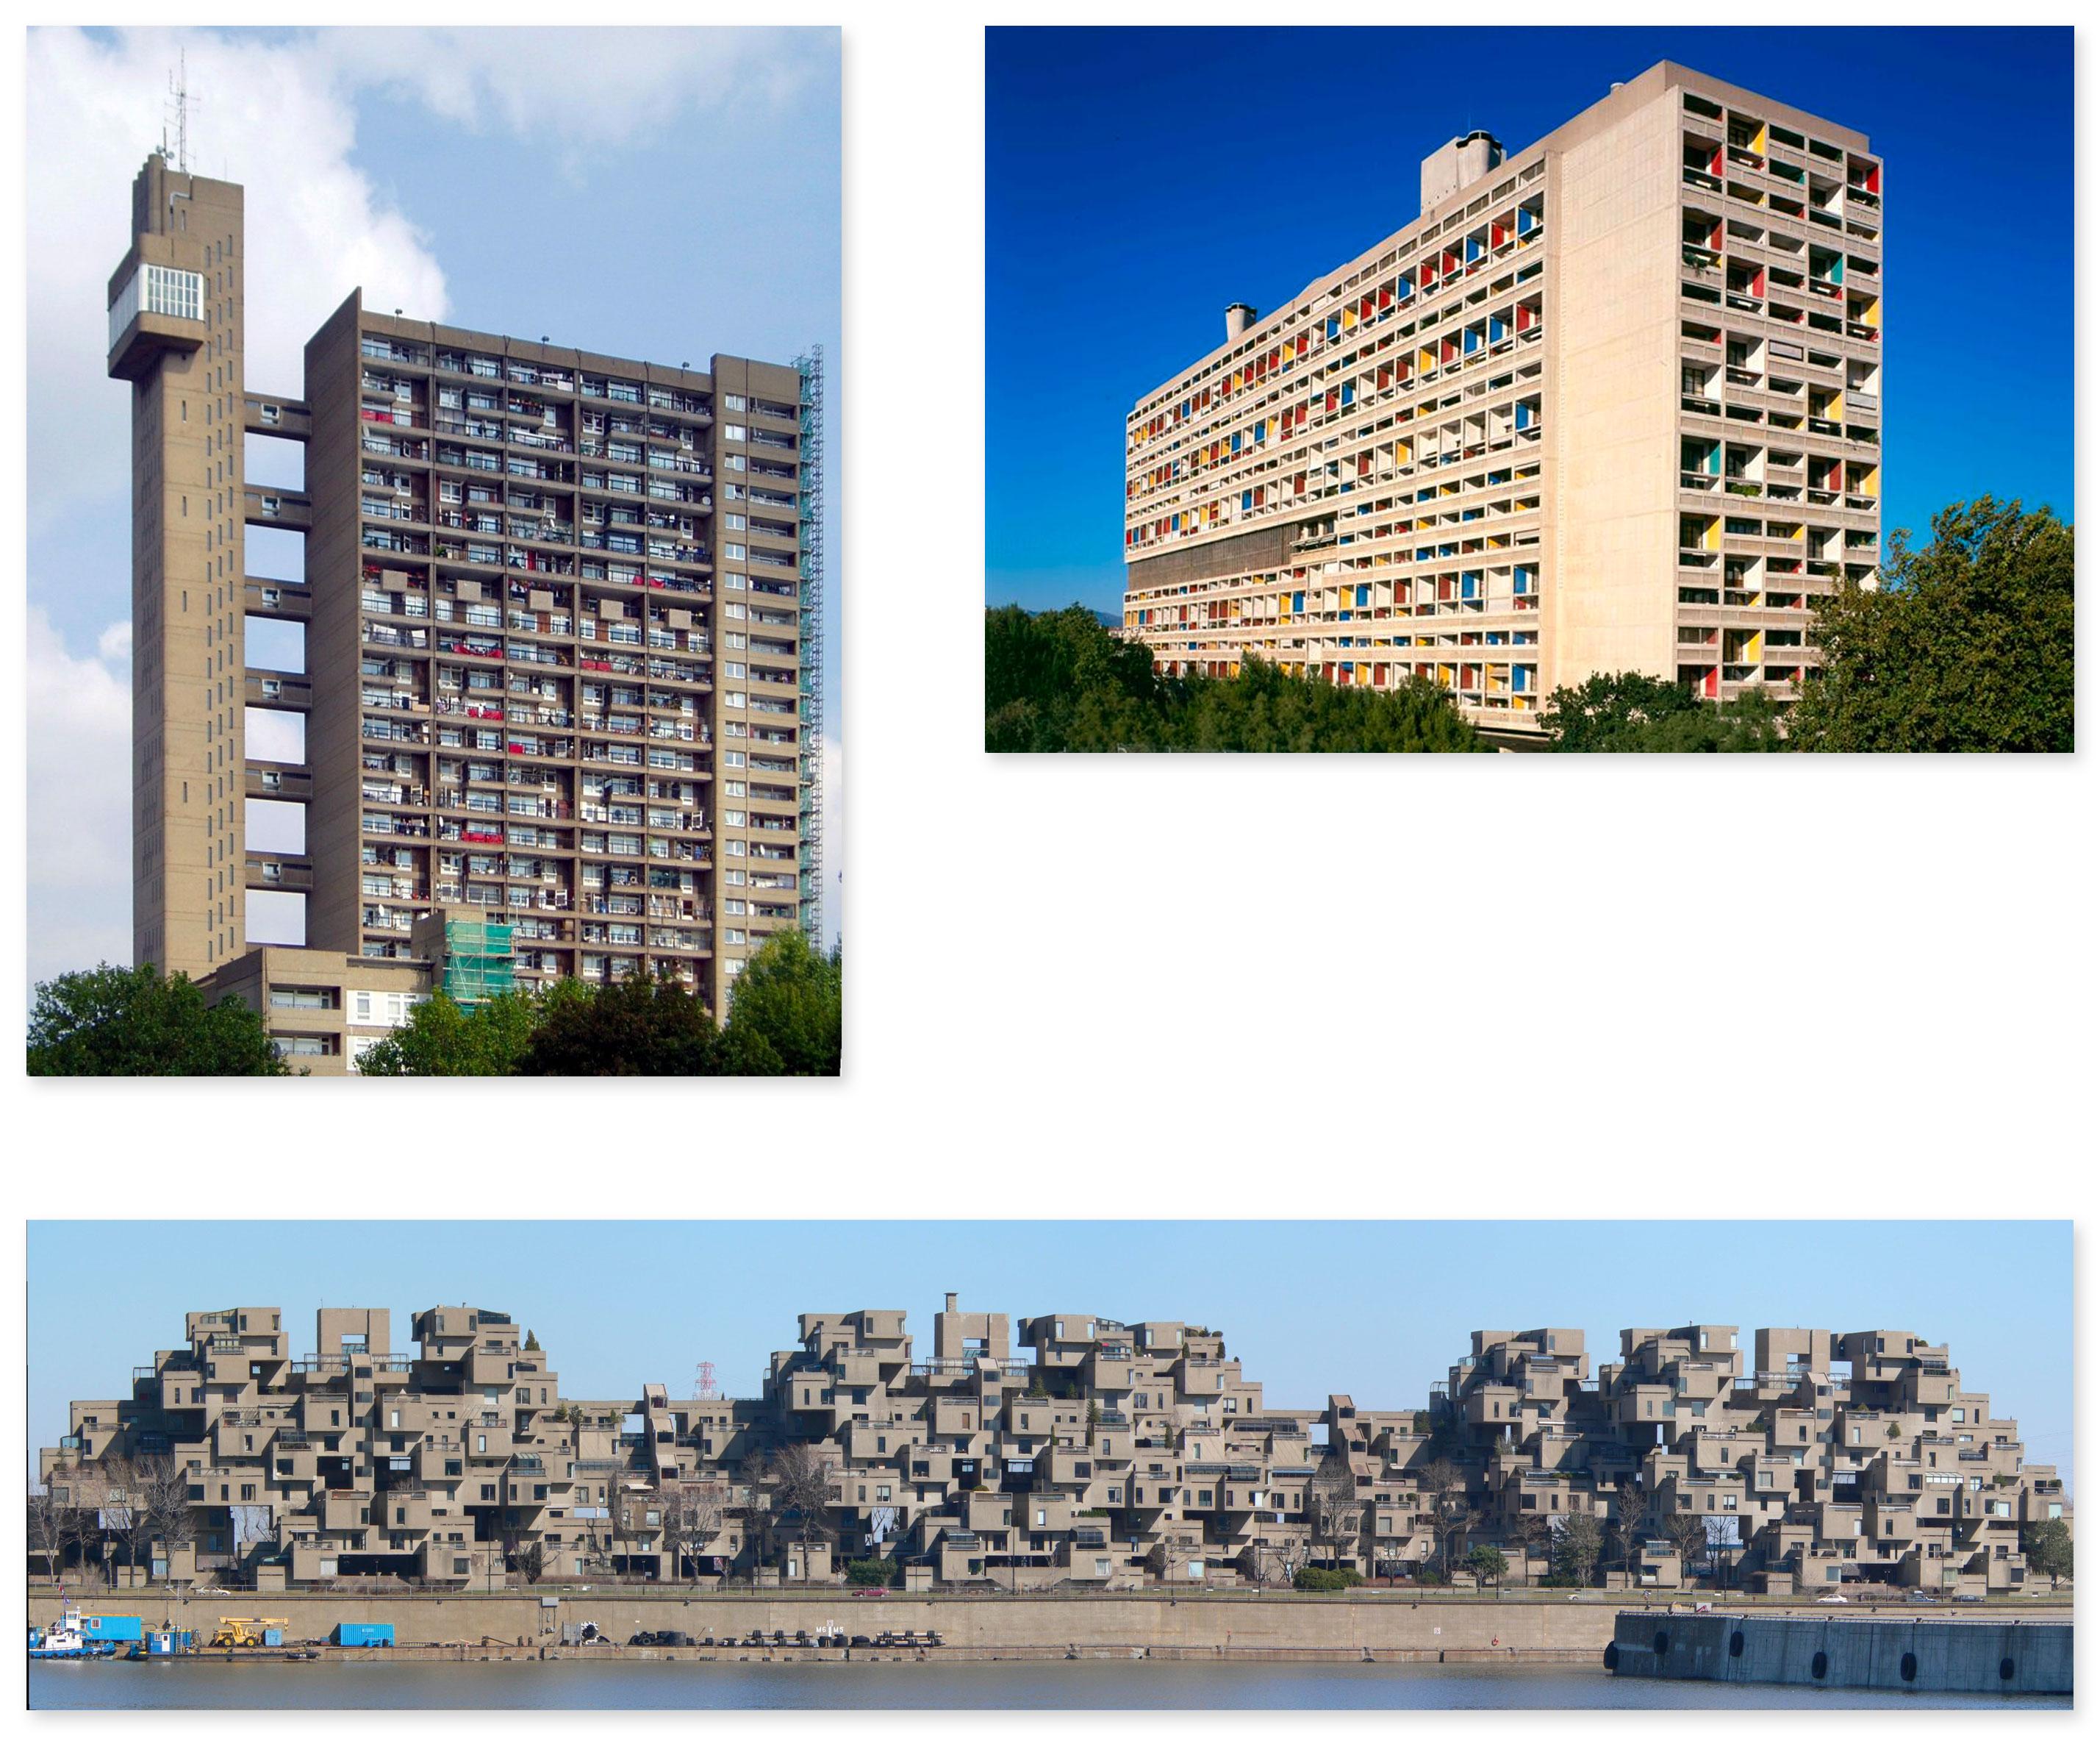 Trellick Tower, London, 1966–1972, designed by Ernő Goldfinger; Le Corbusier's Unité d'habitation in Marseille, France (1952); Habitat 67 in Montreal, Quebec, Canada